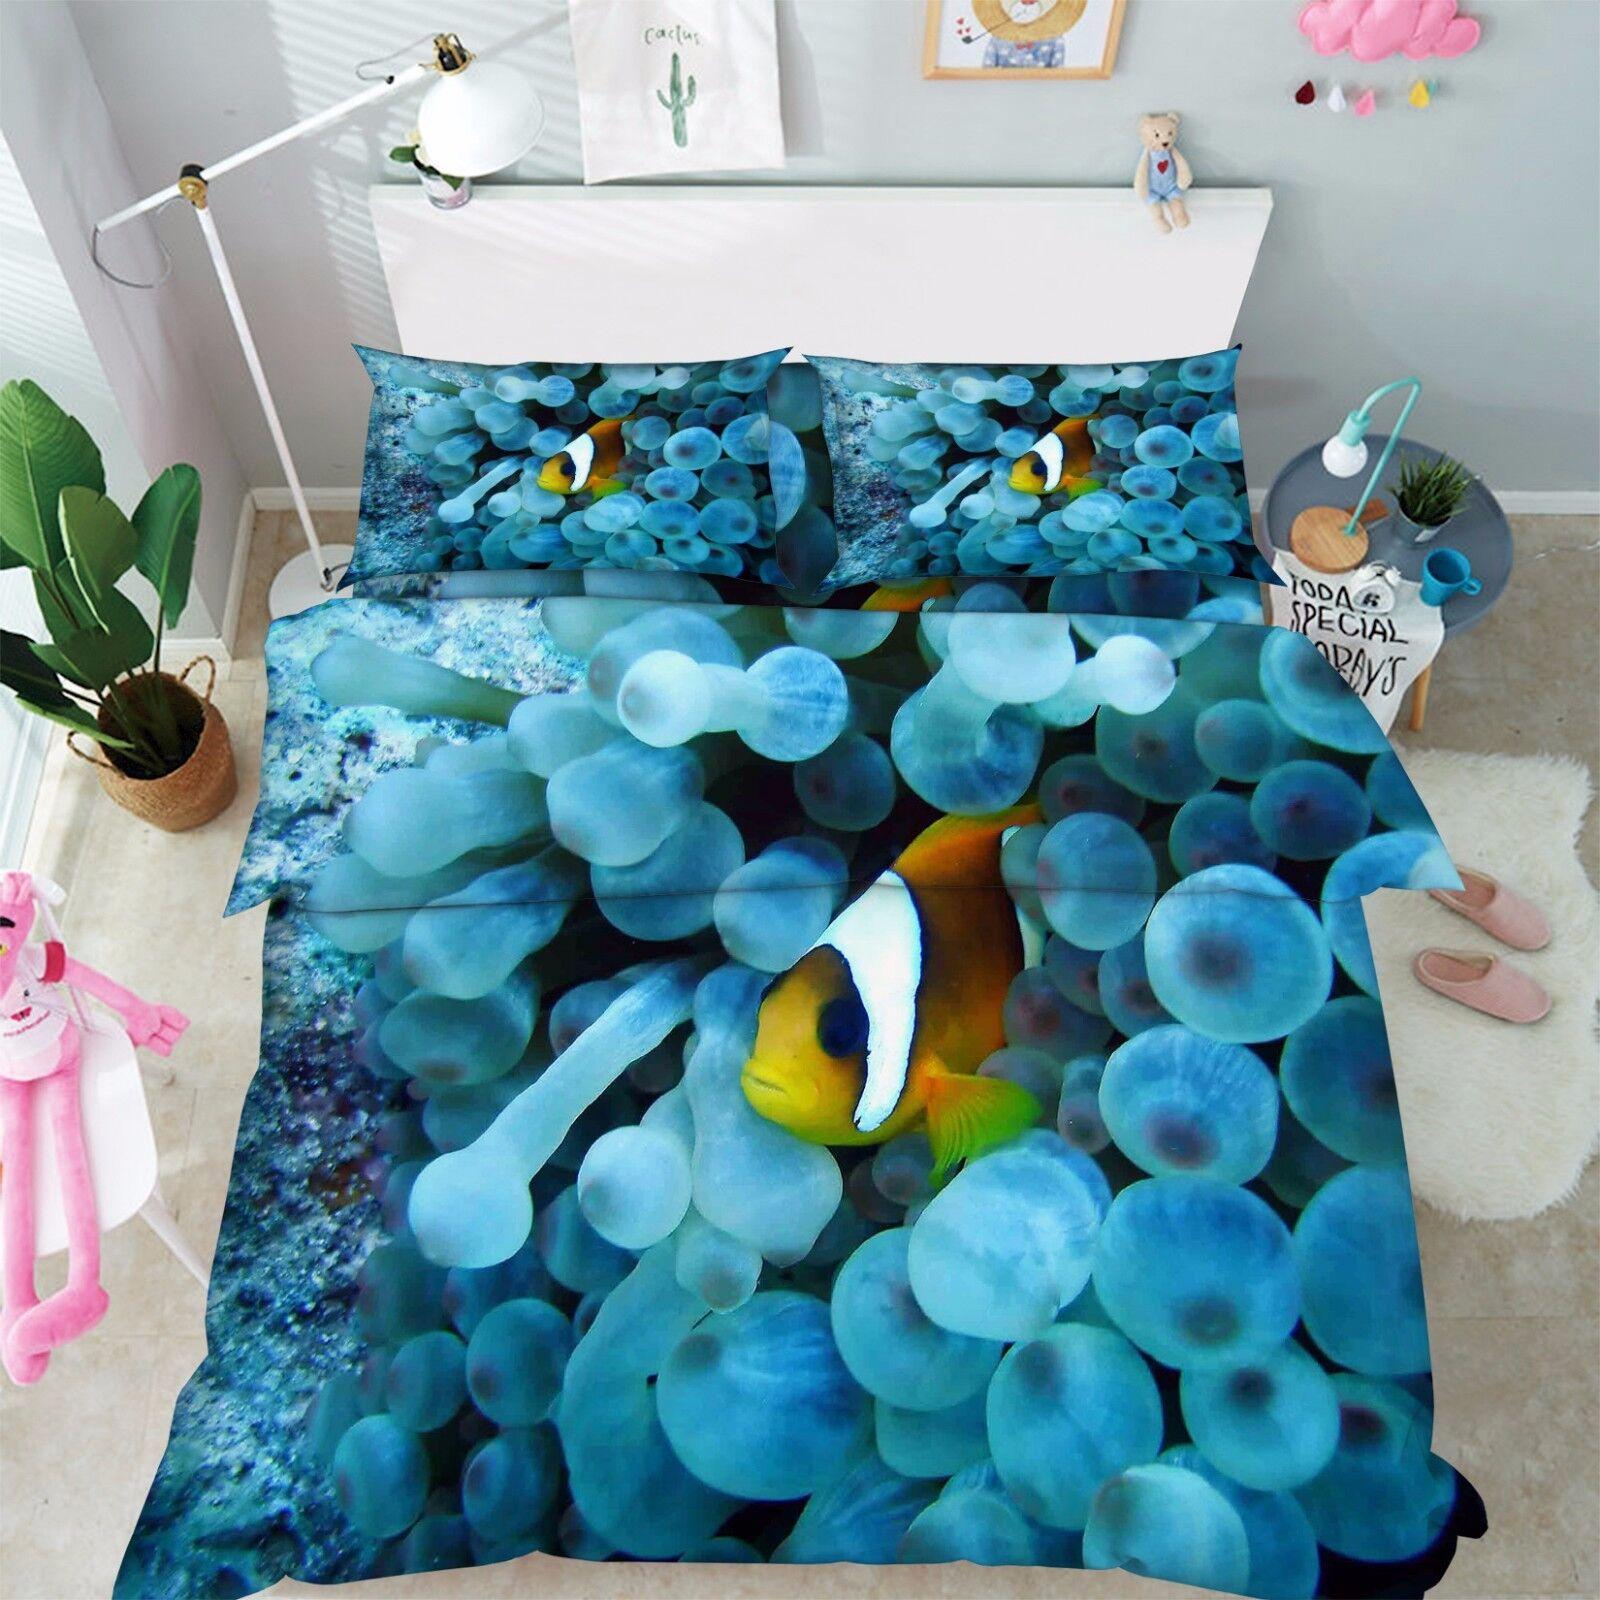 3D Jellyfish 816 Bed Pillowcases Quilt Duvet Cover Set Single Queen UK Kyra